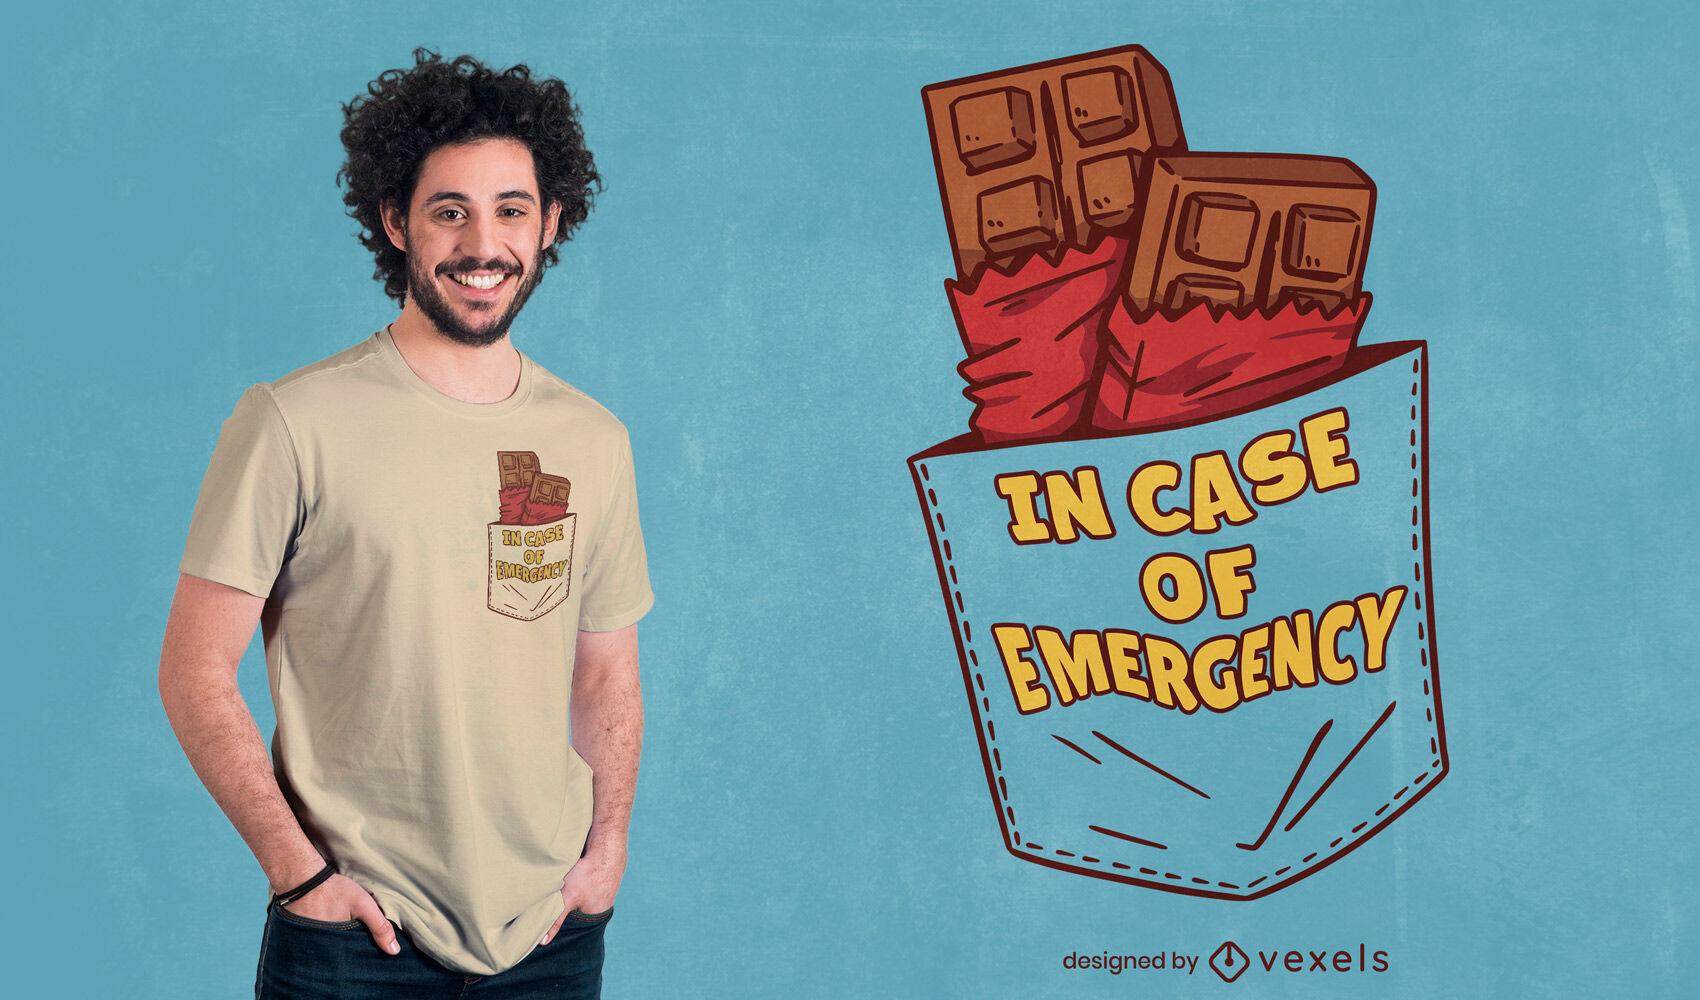 Diseño de camiseta de barra de chocolate de emergencia.